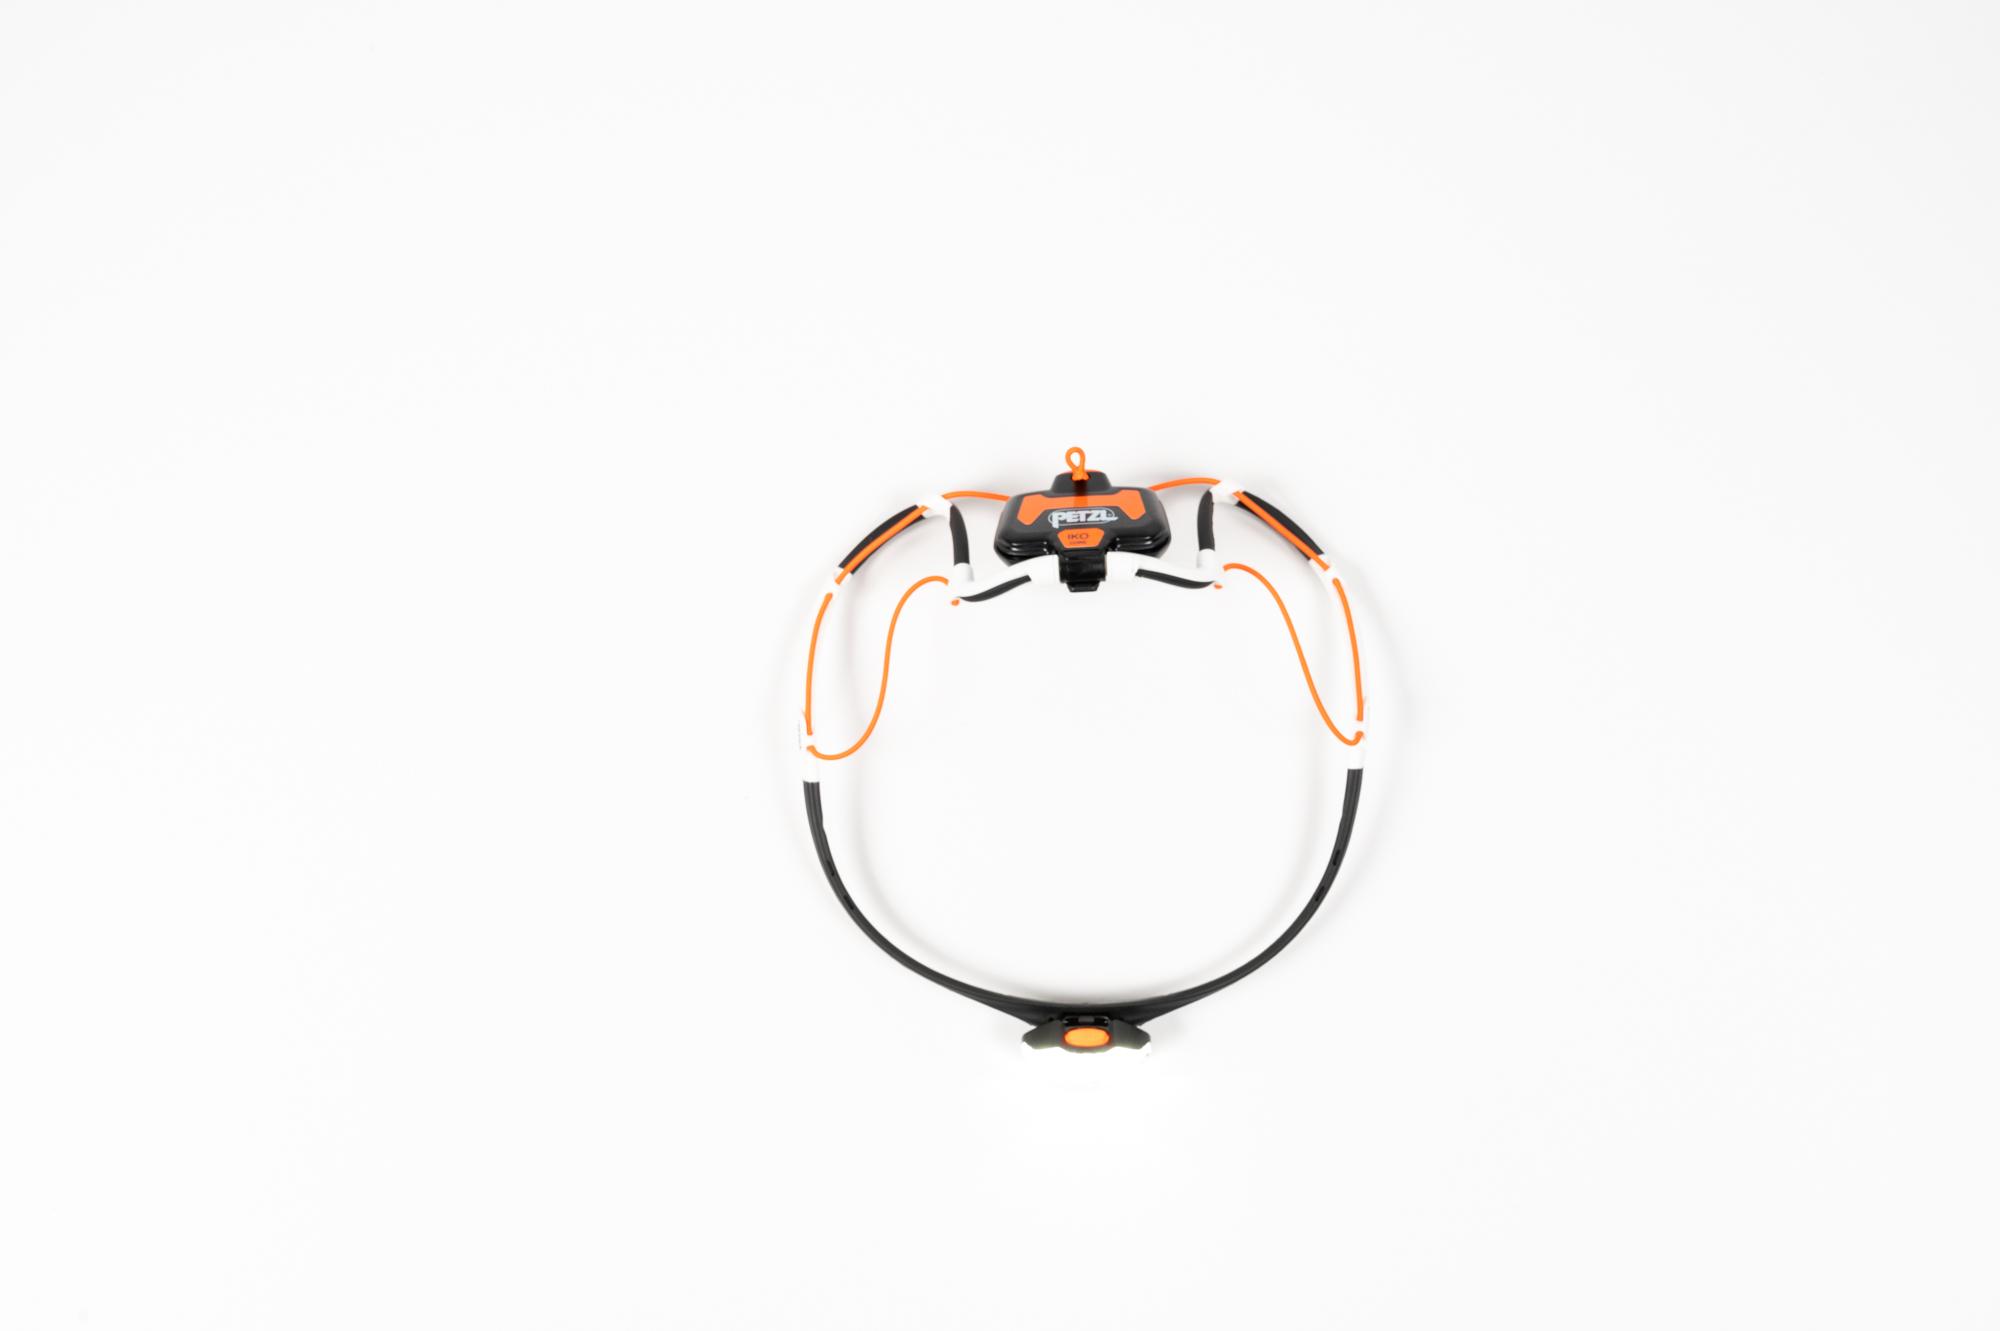 Produkttest Petzl IKO Core Stirnlampe